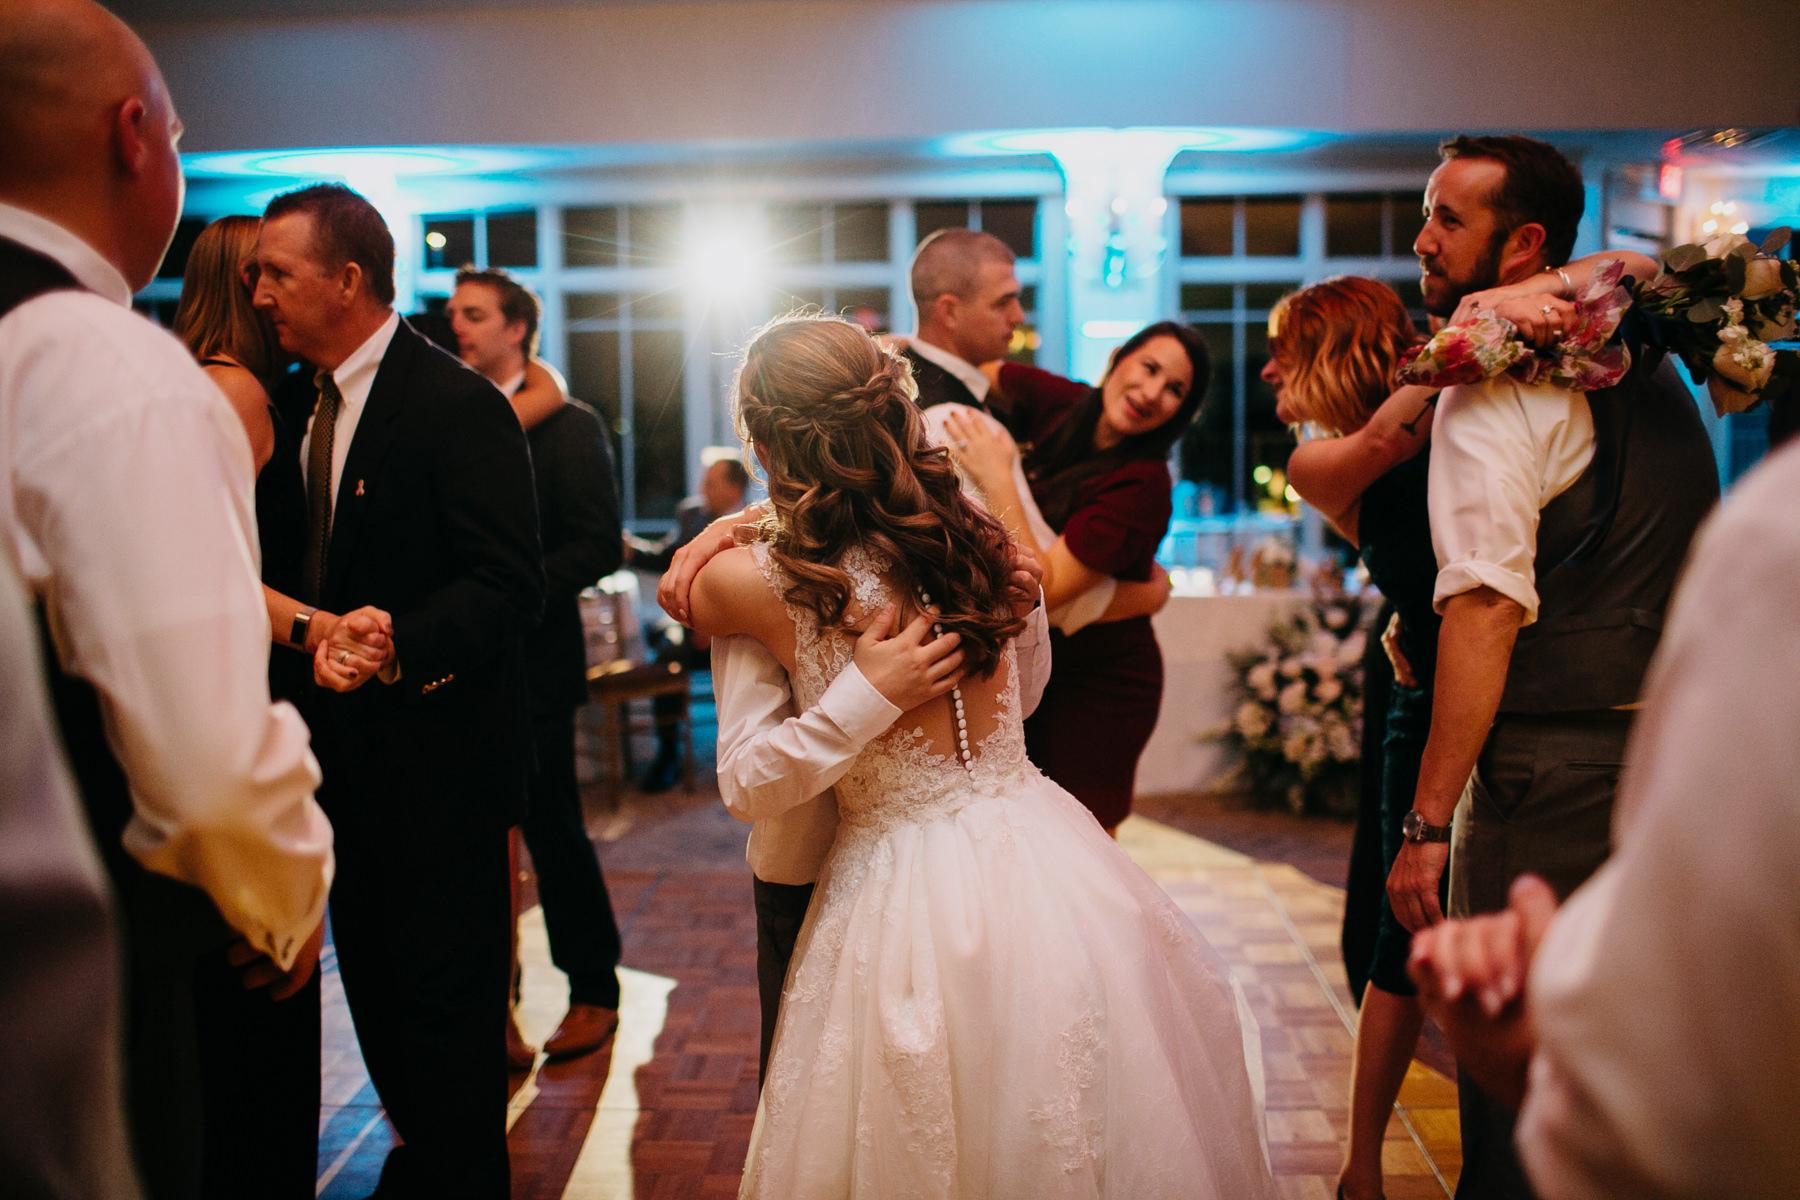 Quincy Ma Massachusetts Wedding Dedham Boston Granie Links Wedding New England Catholic Cathedral Liz Osban Photography 135.jpg